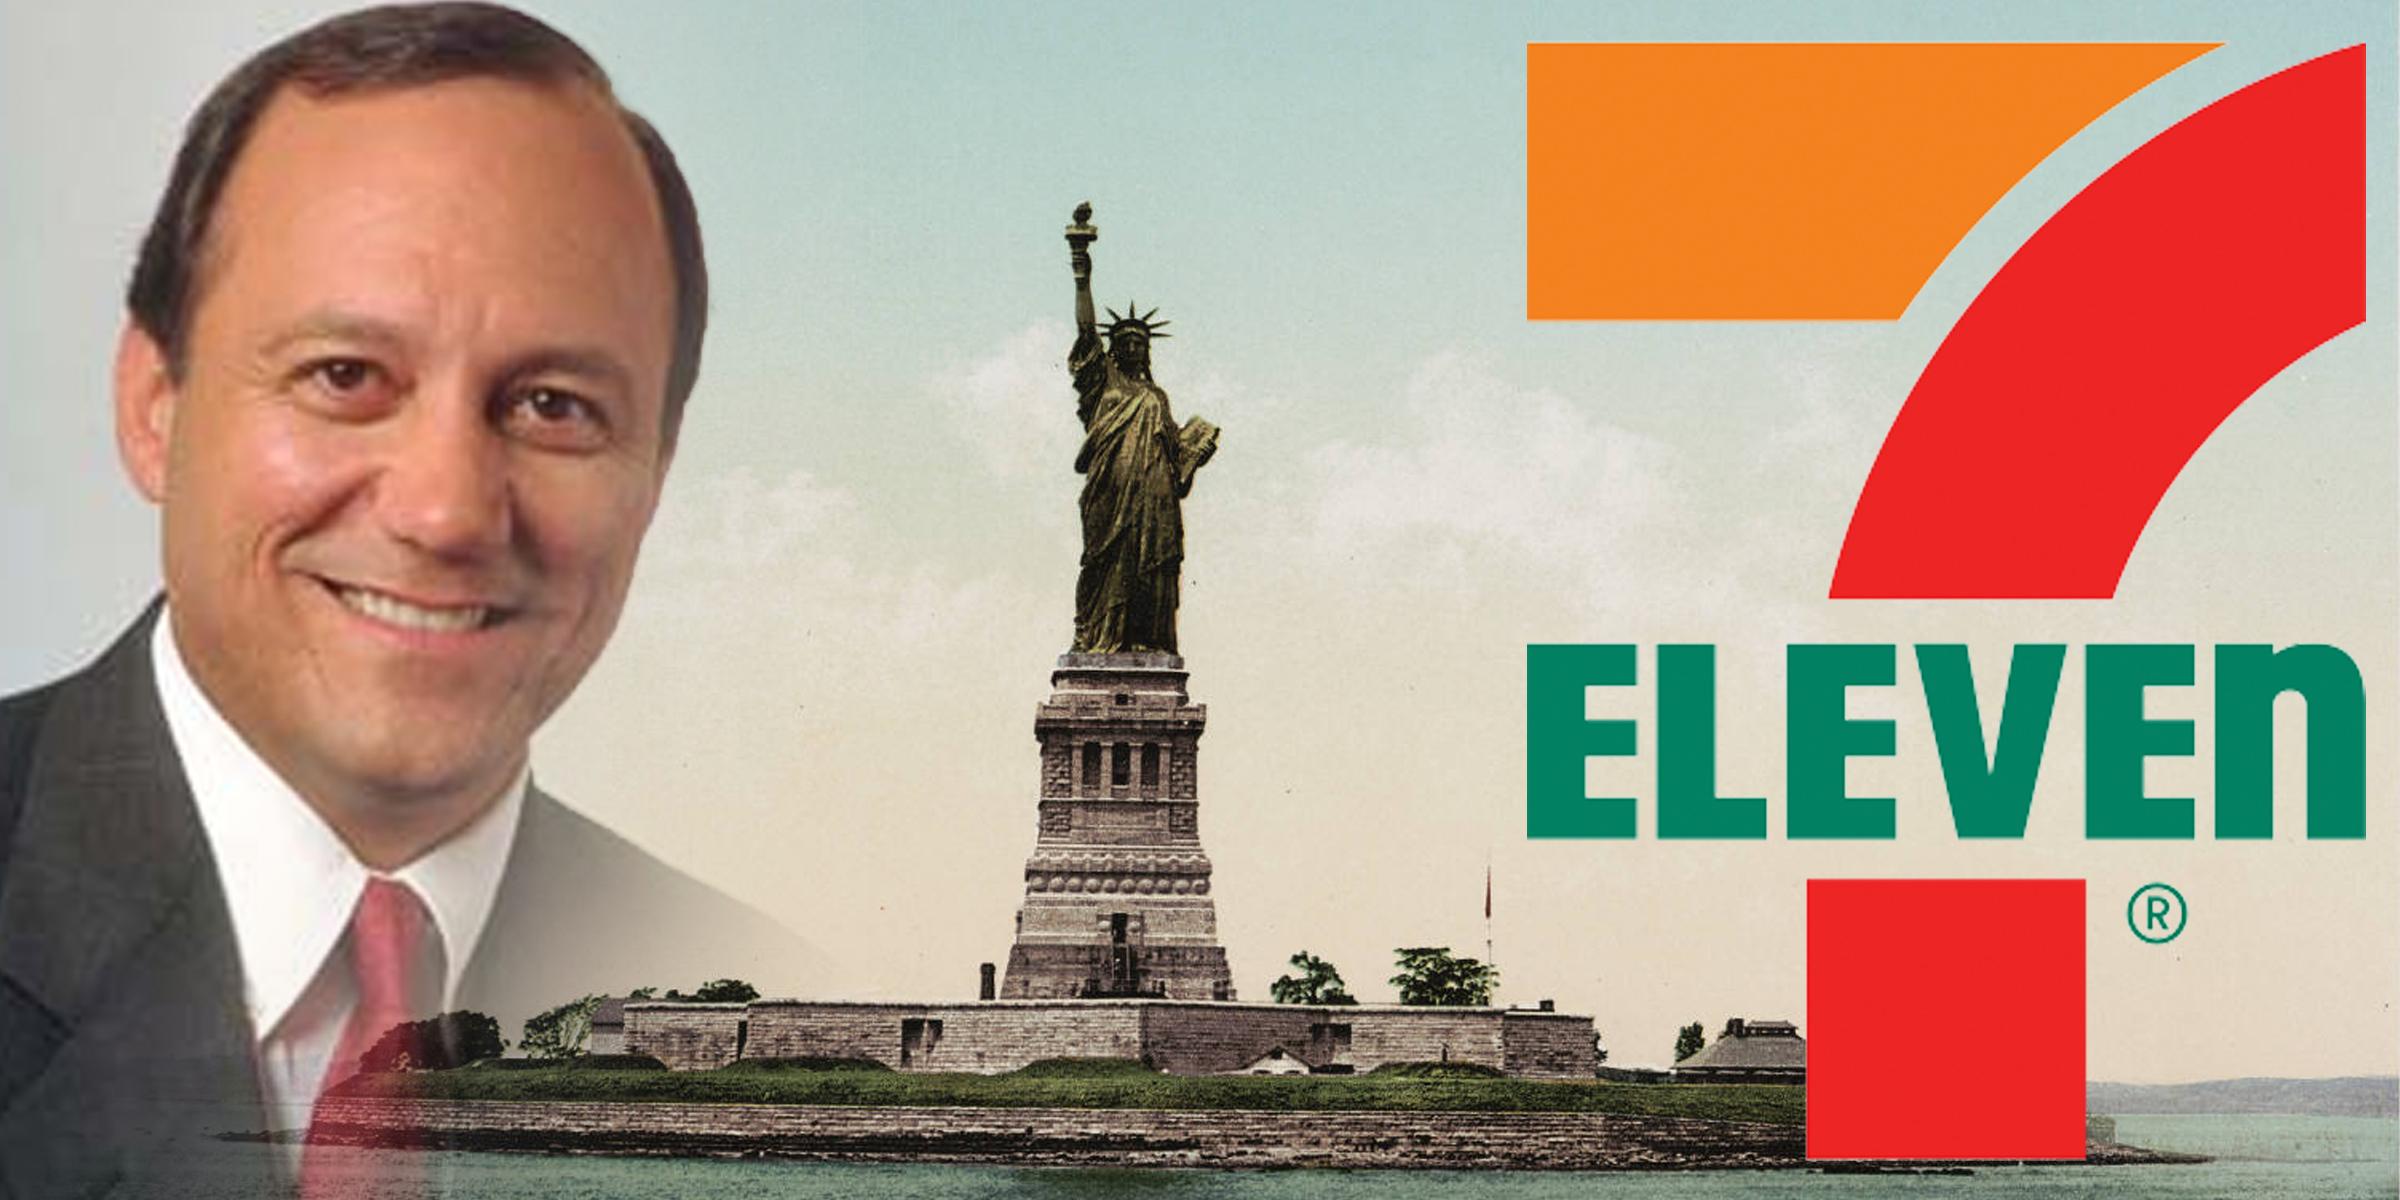 7-Eleven and the American Dream